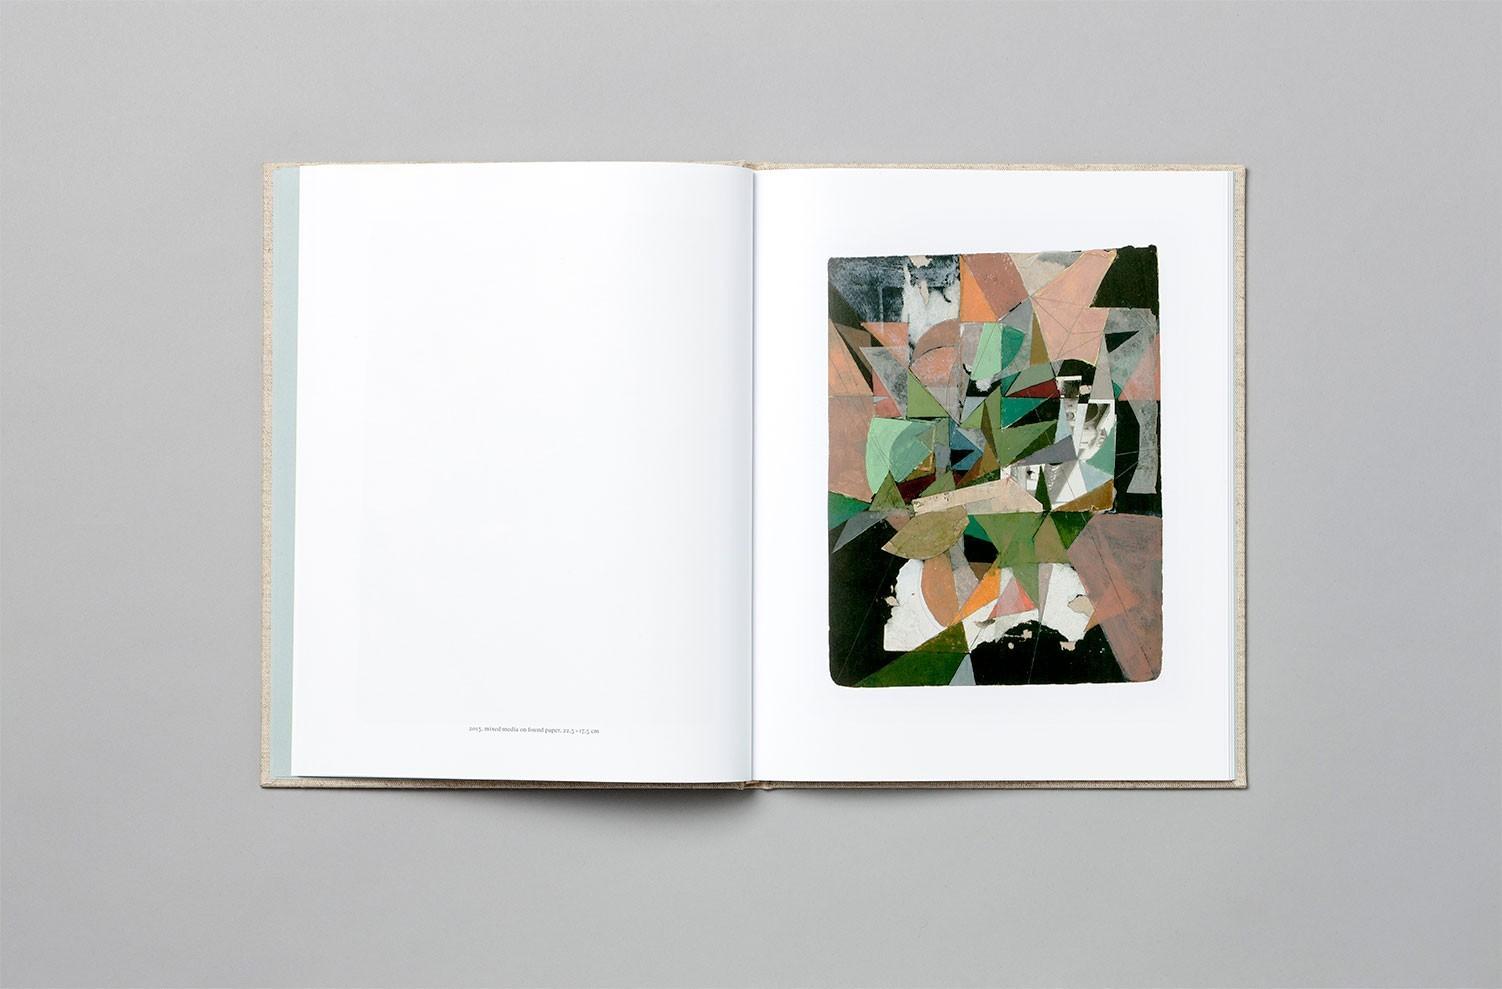 ritator_hans_andersson_artist_book_6